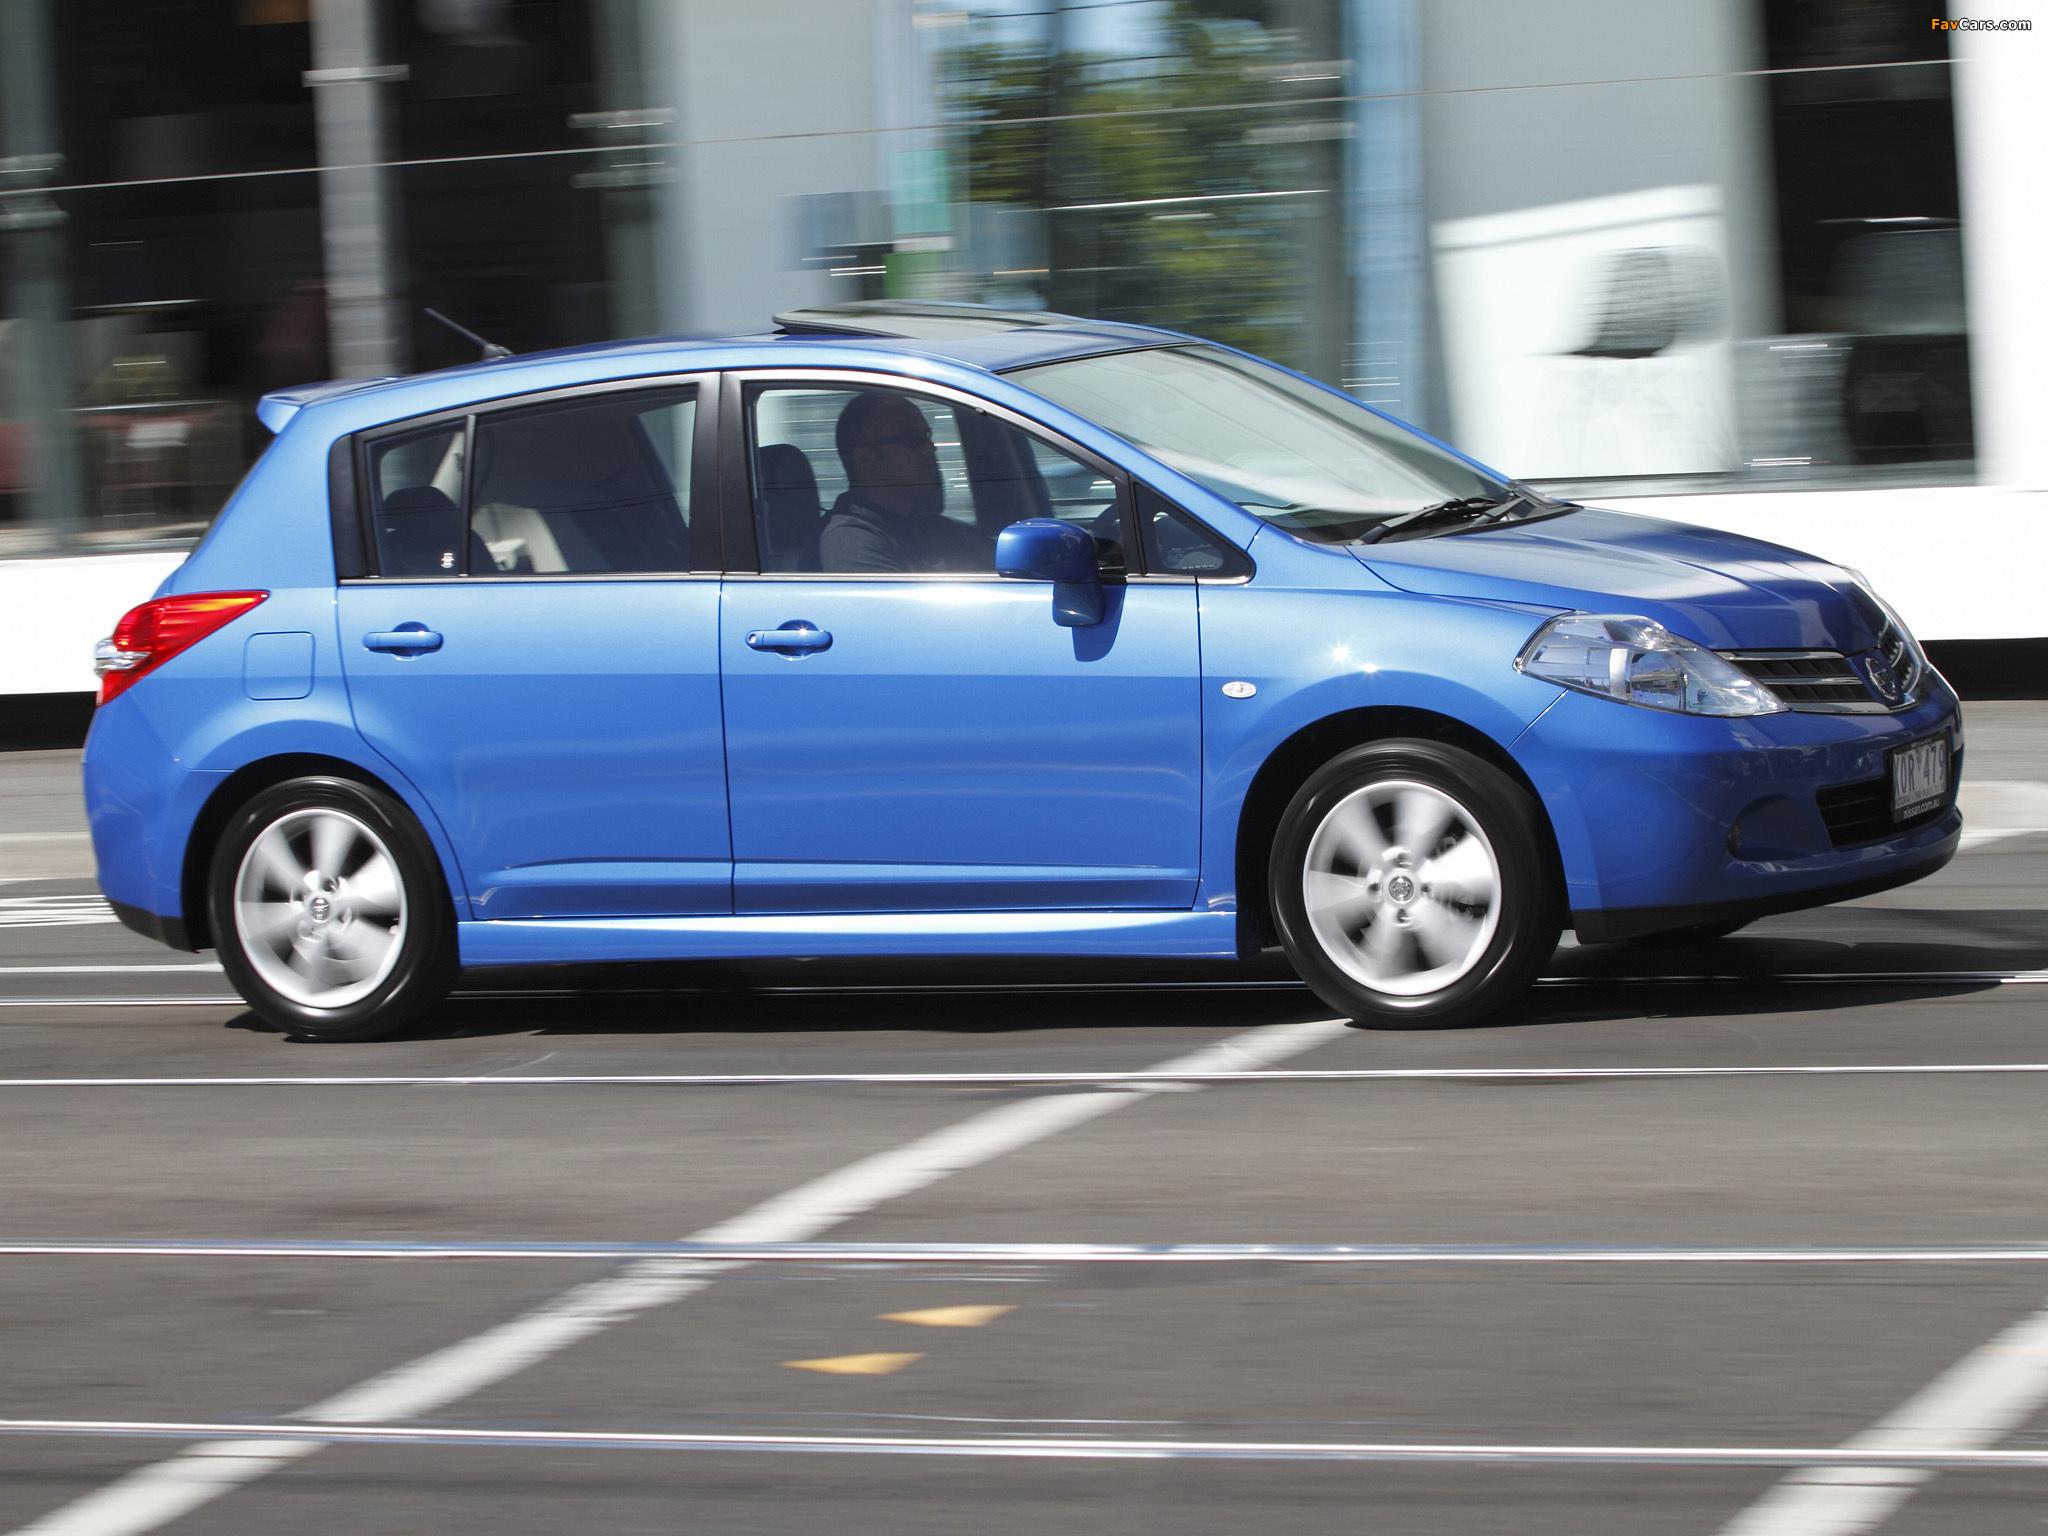 Nissan Tiida Hatchback AU-spec (C11) 2010 wallpapers (2048 x 1536)